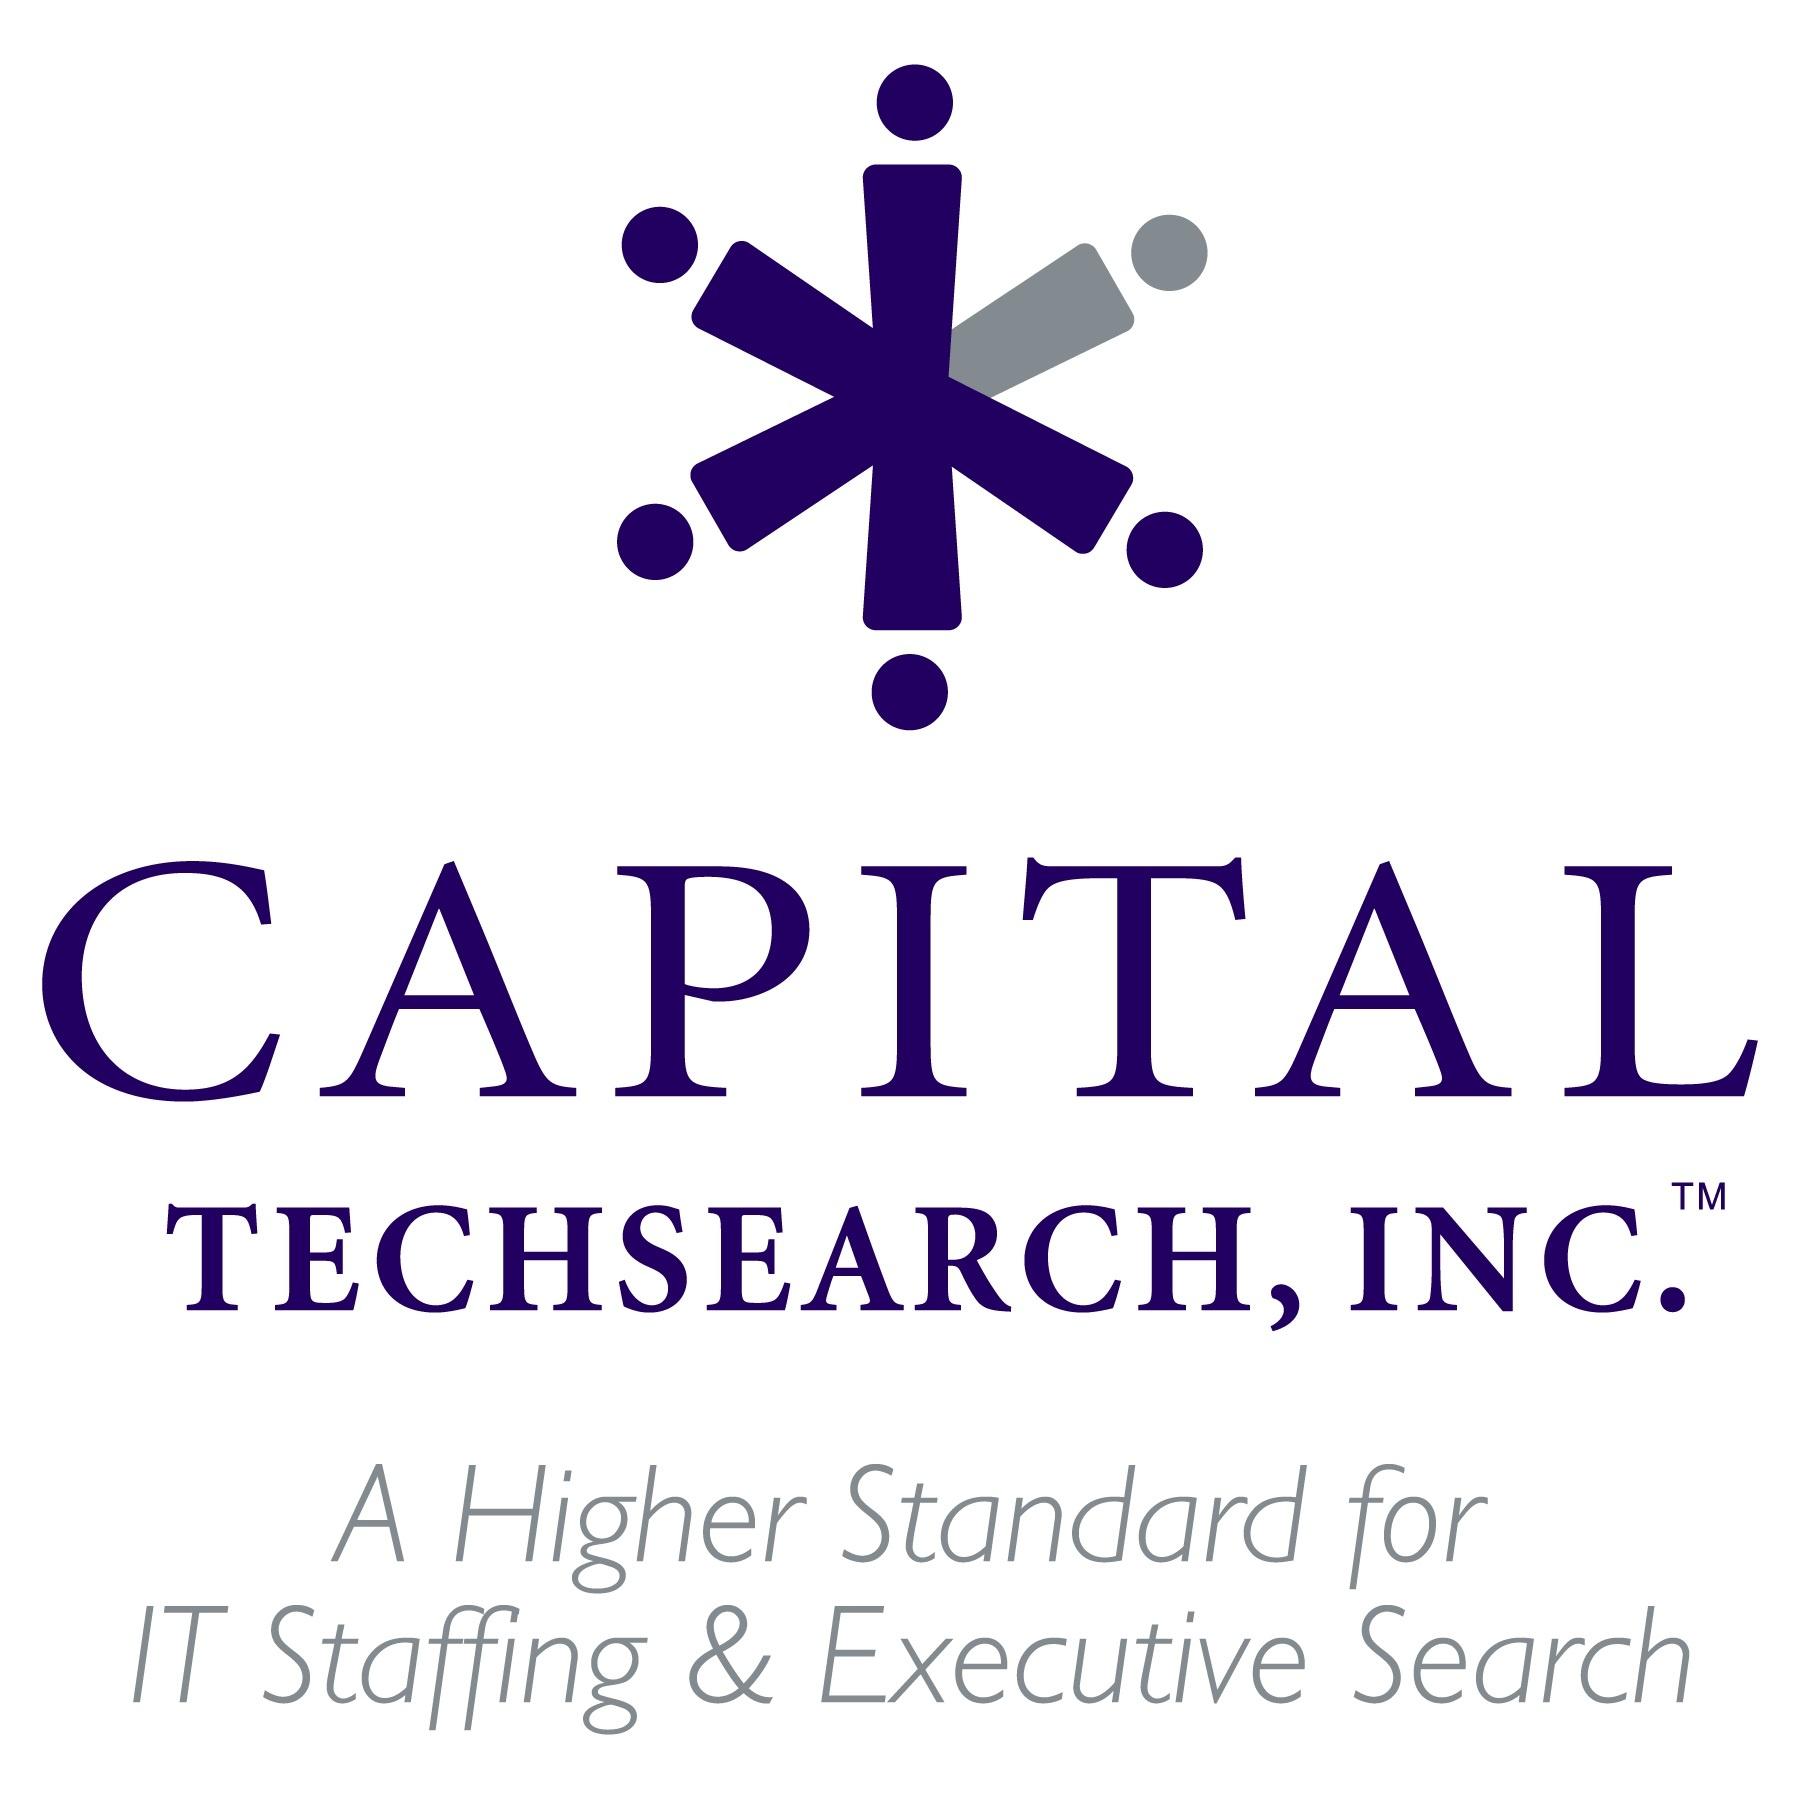 capitaltechsearch-tagline